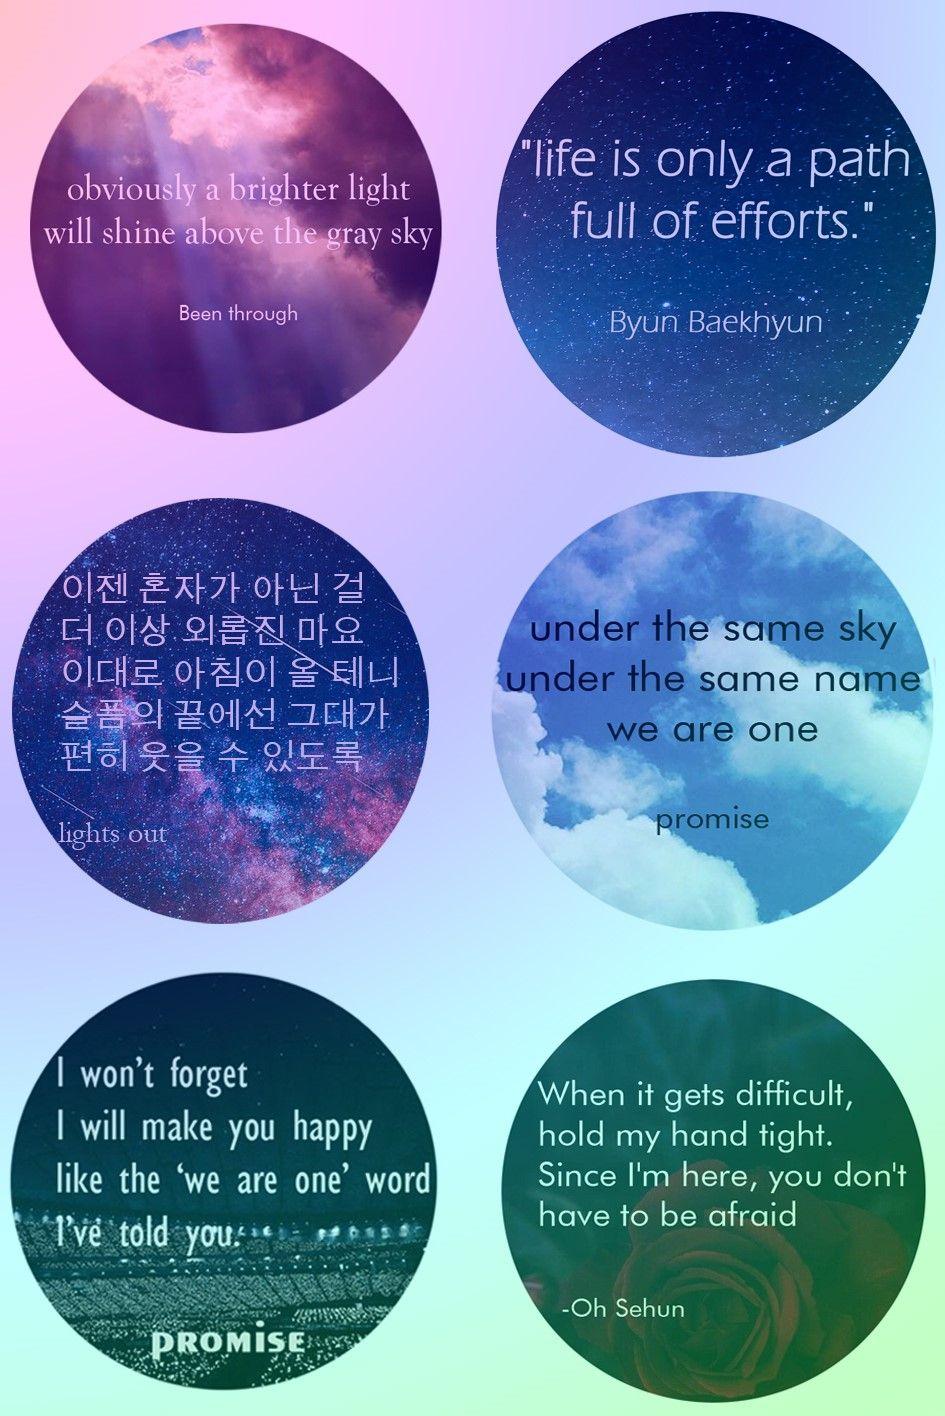 exo quotes sehun baekhyun promise baekhyun promise quotes exo